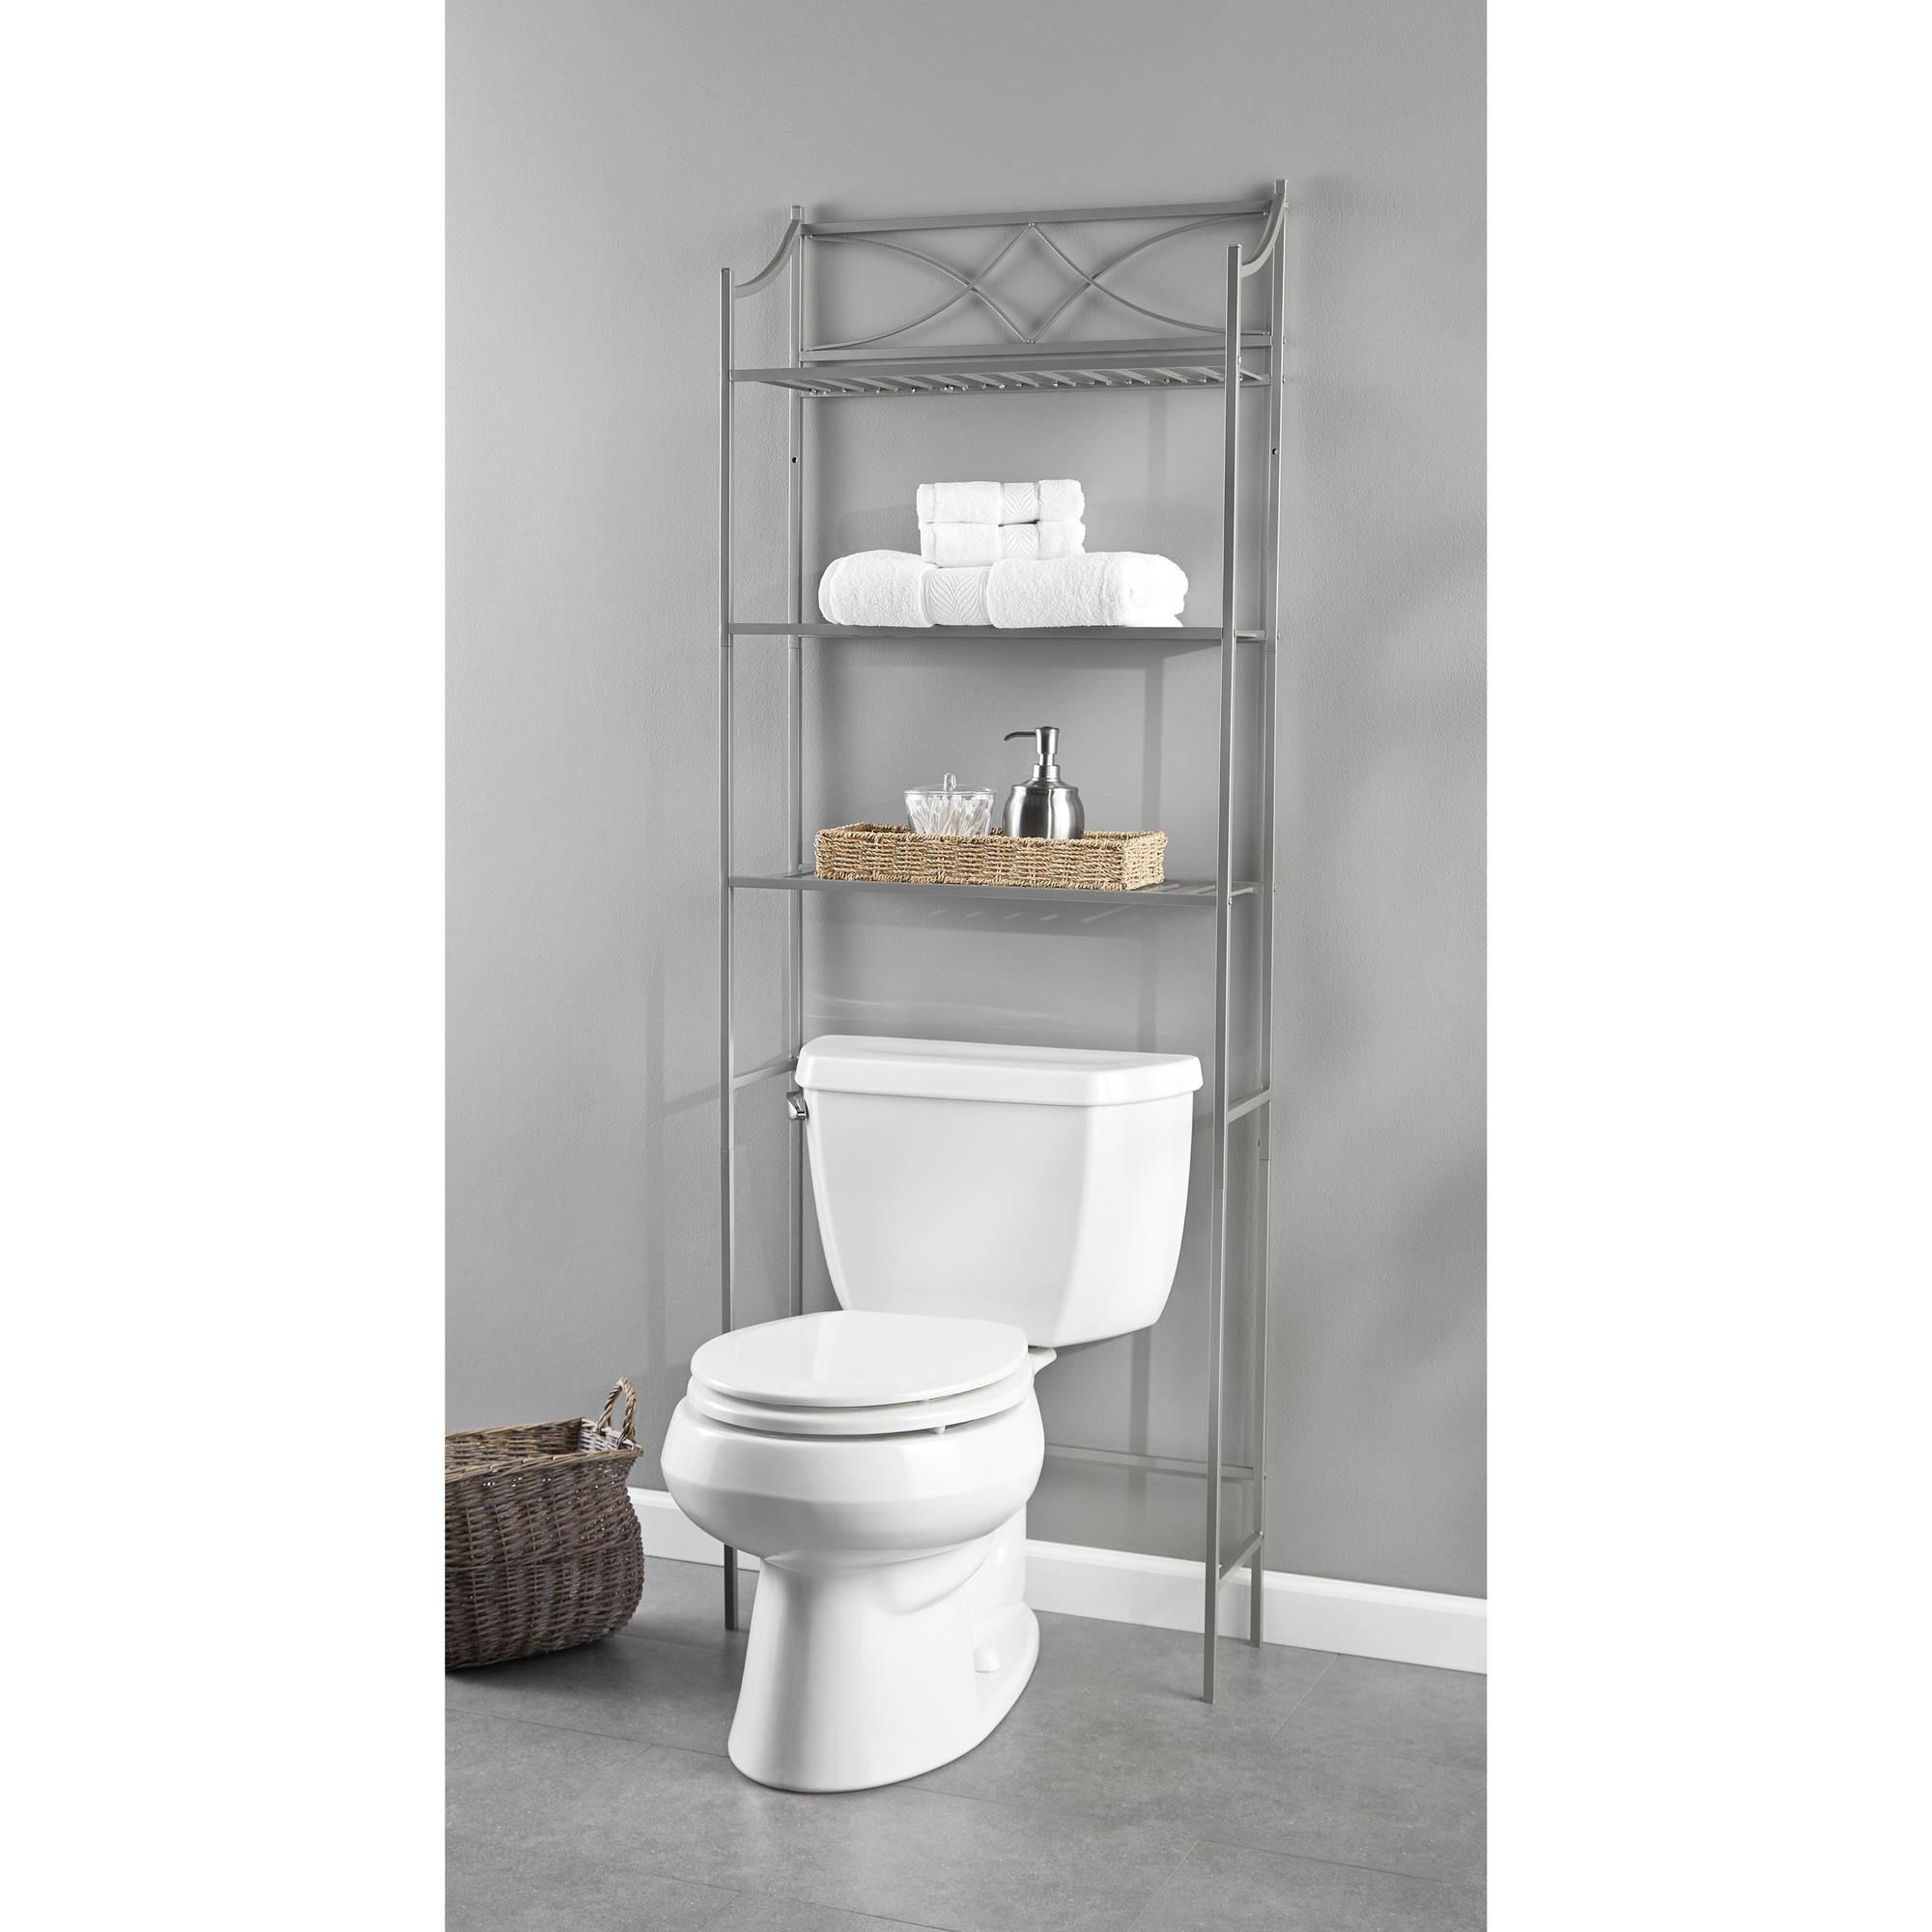 ... amazing bathroom e savers image design ideas gallery ...